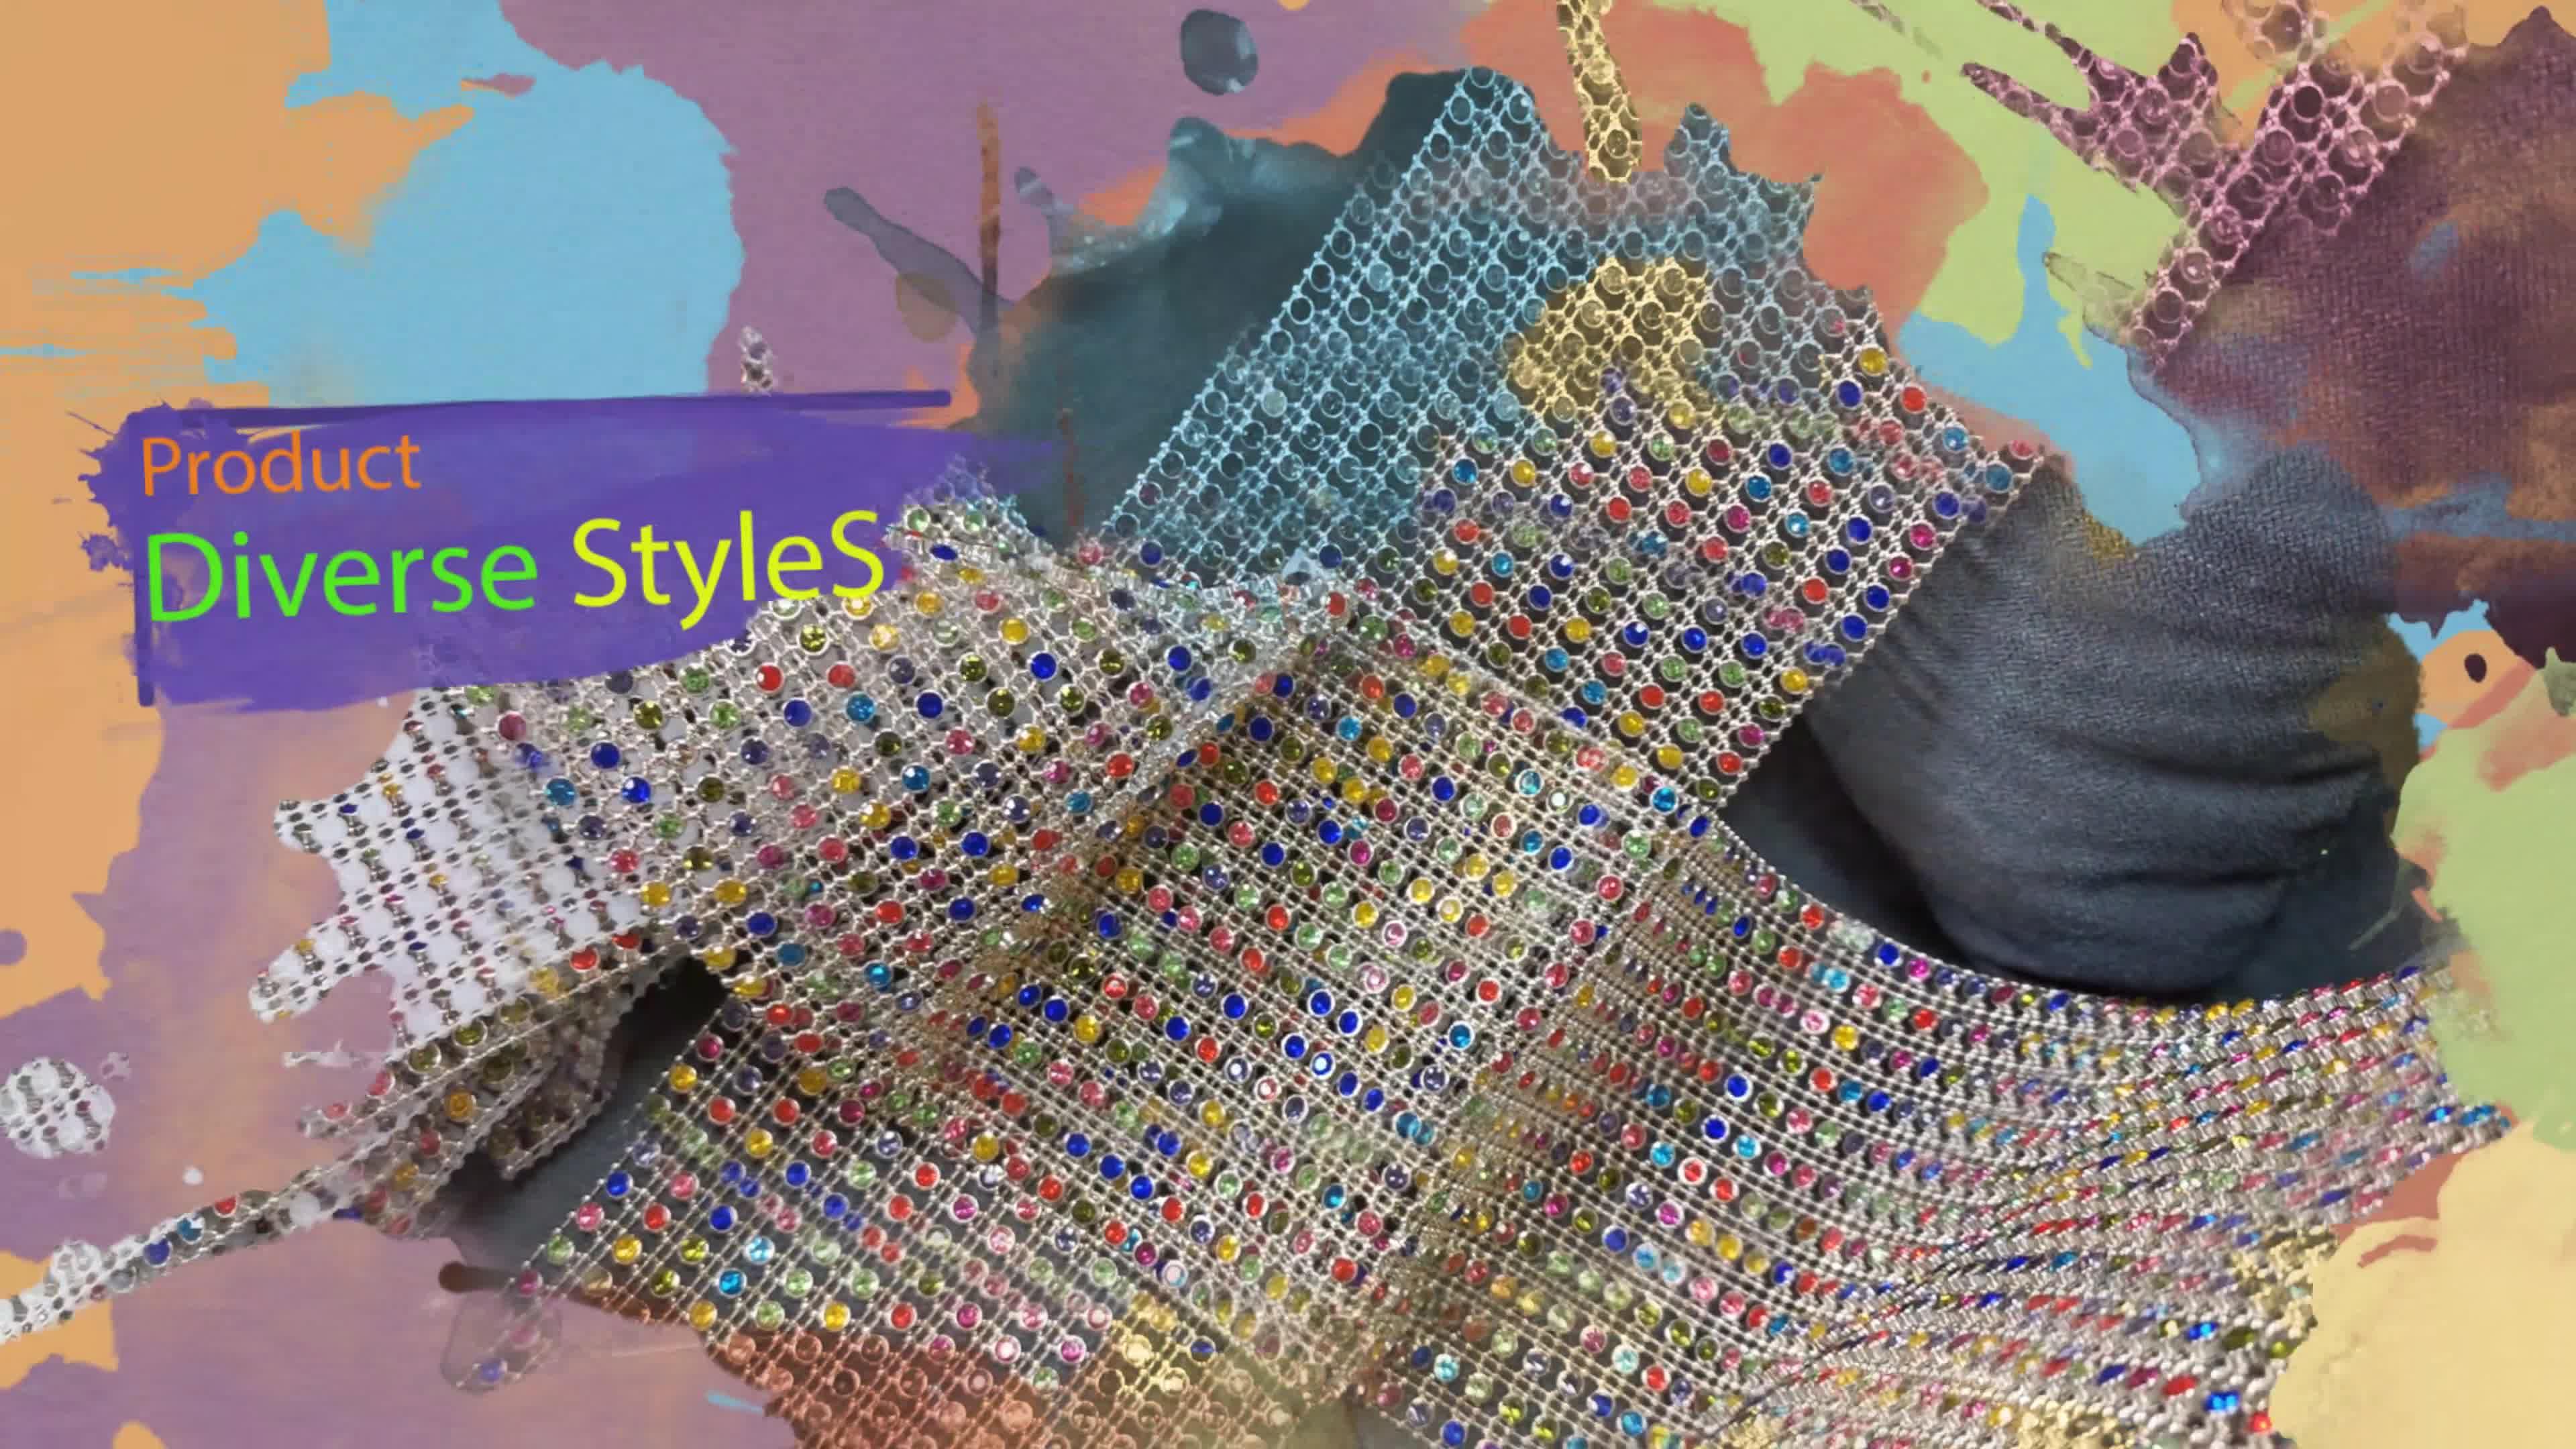 Grosir 24 Baris 4 MM 10 Meter Emas Plastik Rhinestone Lembar Pemangkasan Piala Rantai Diamond Mesh Wrap Roll untuk Menghias aksesori